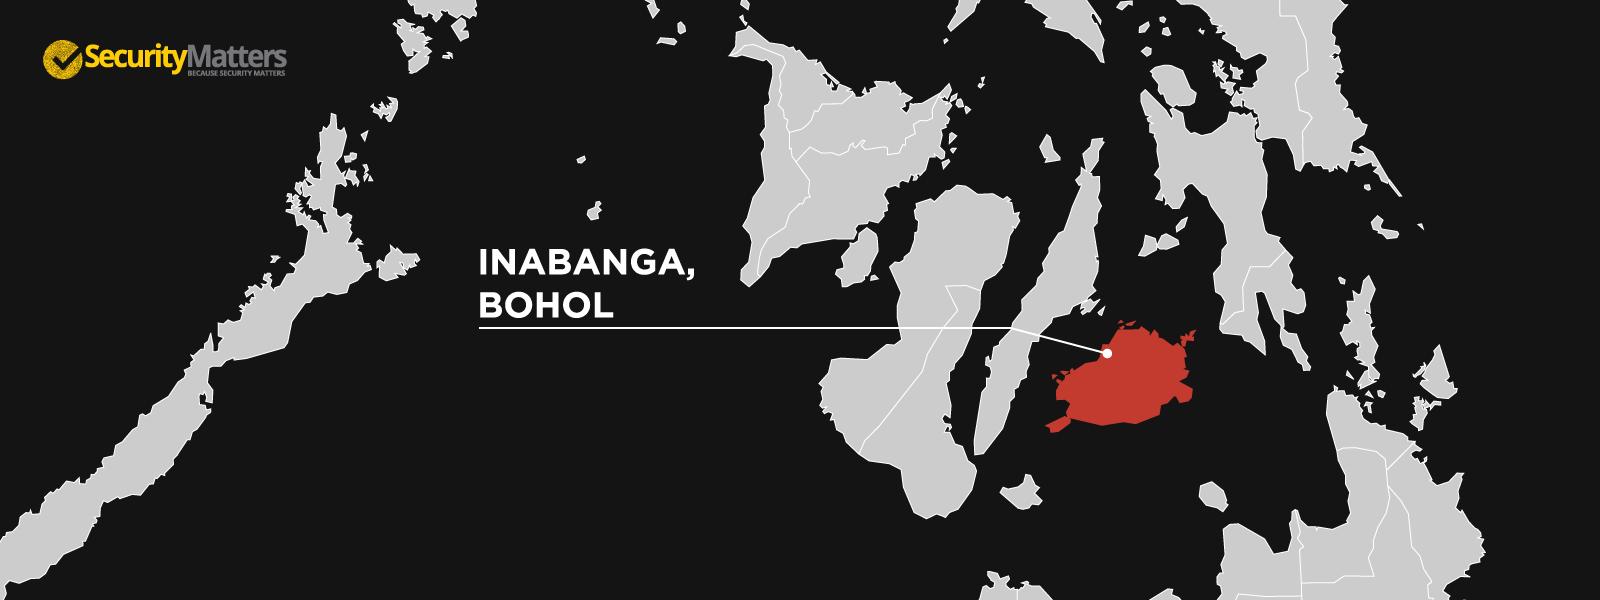 Abu Sayyaf clash hits Bohol tourism